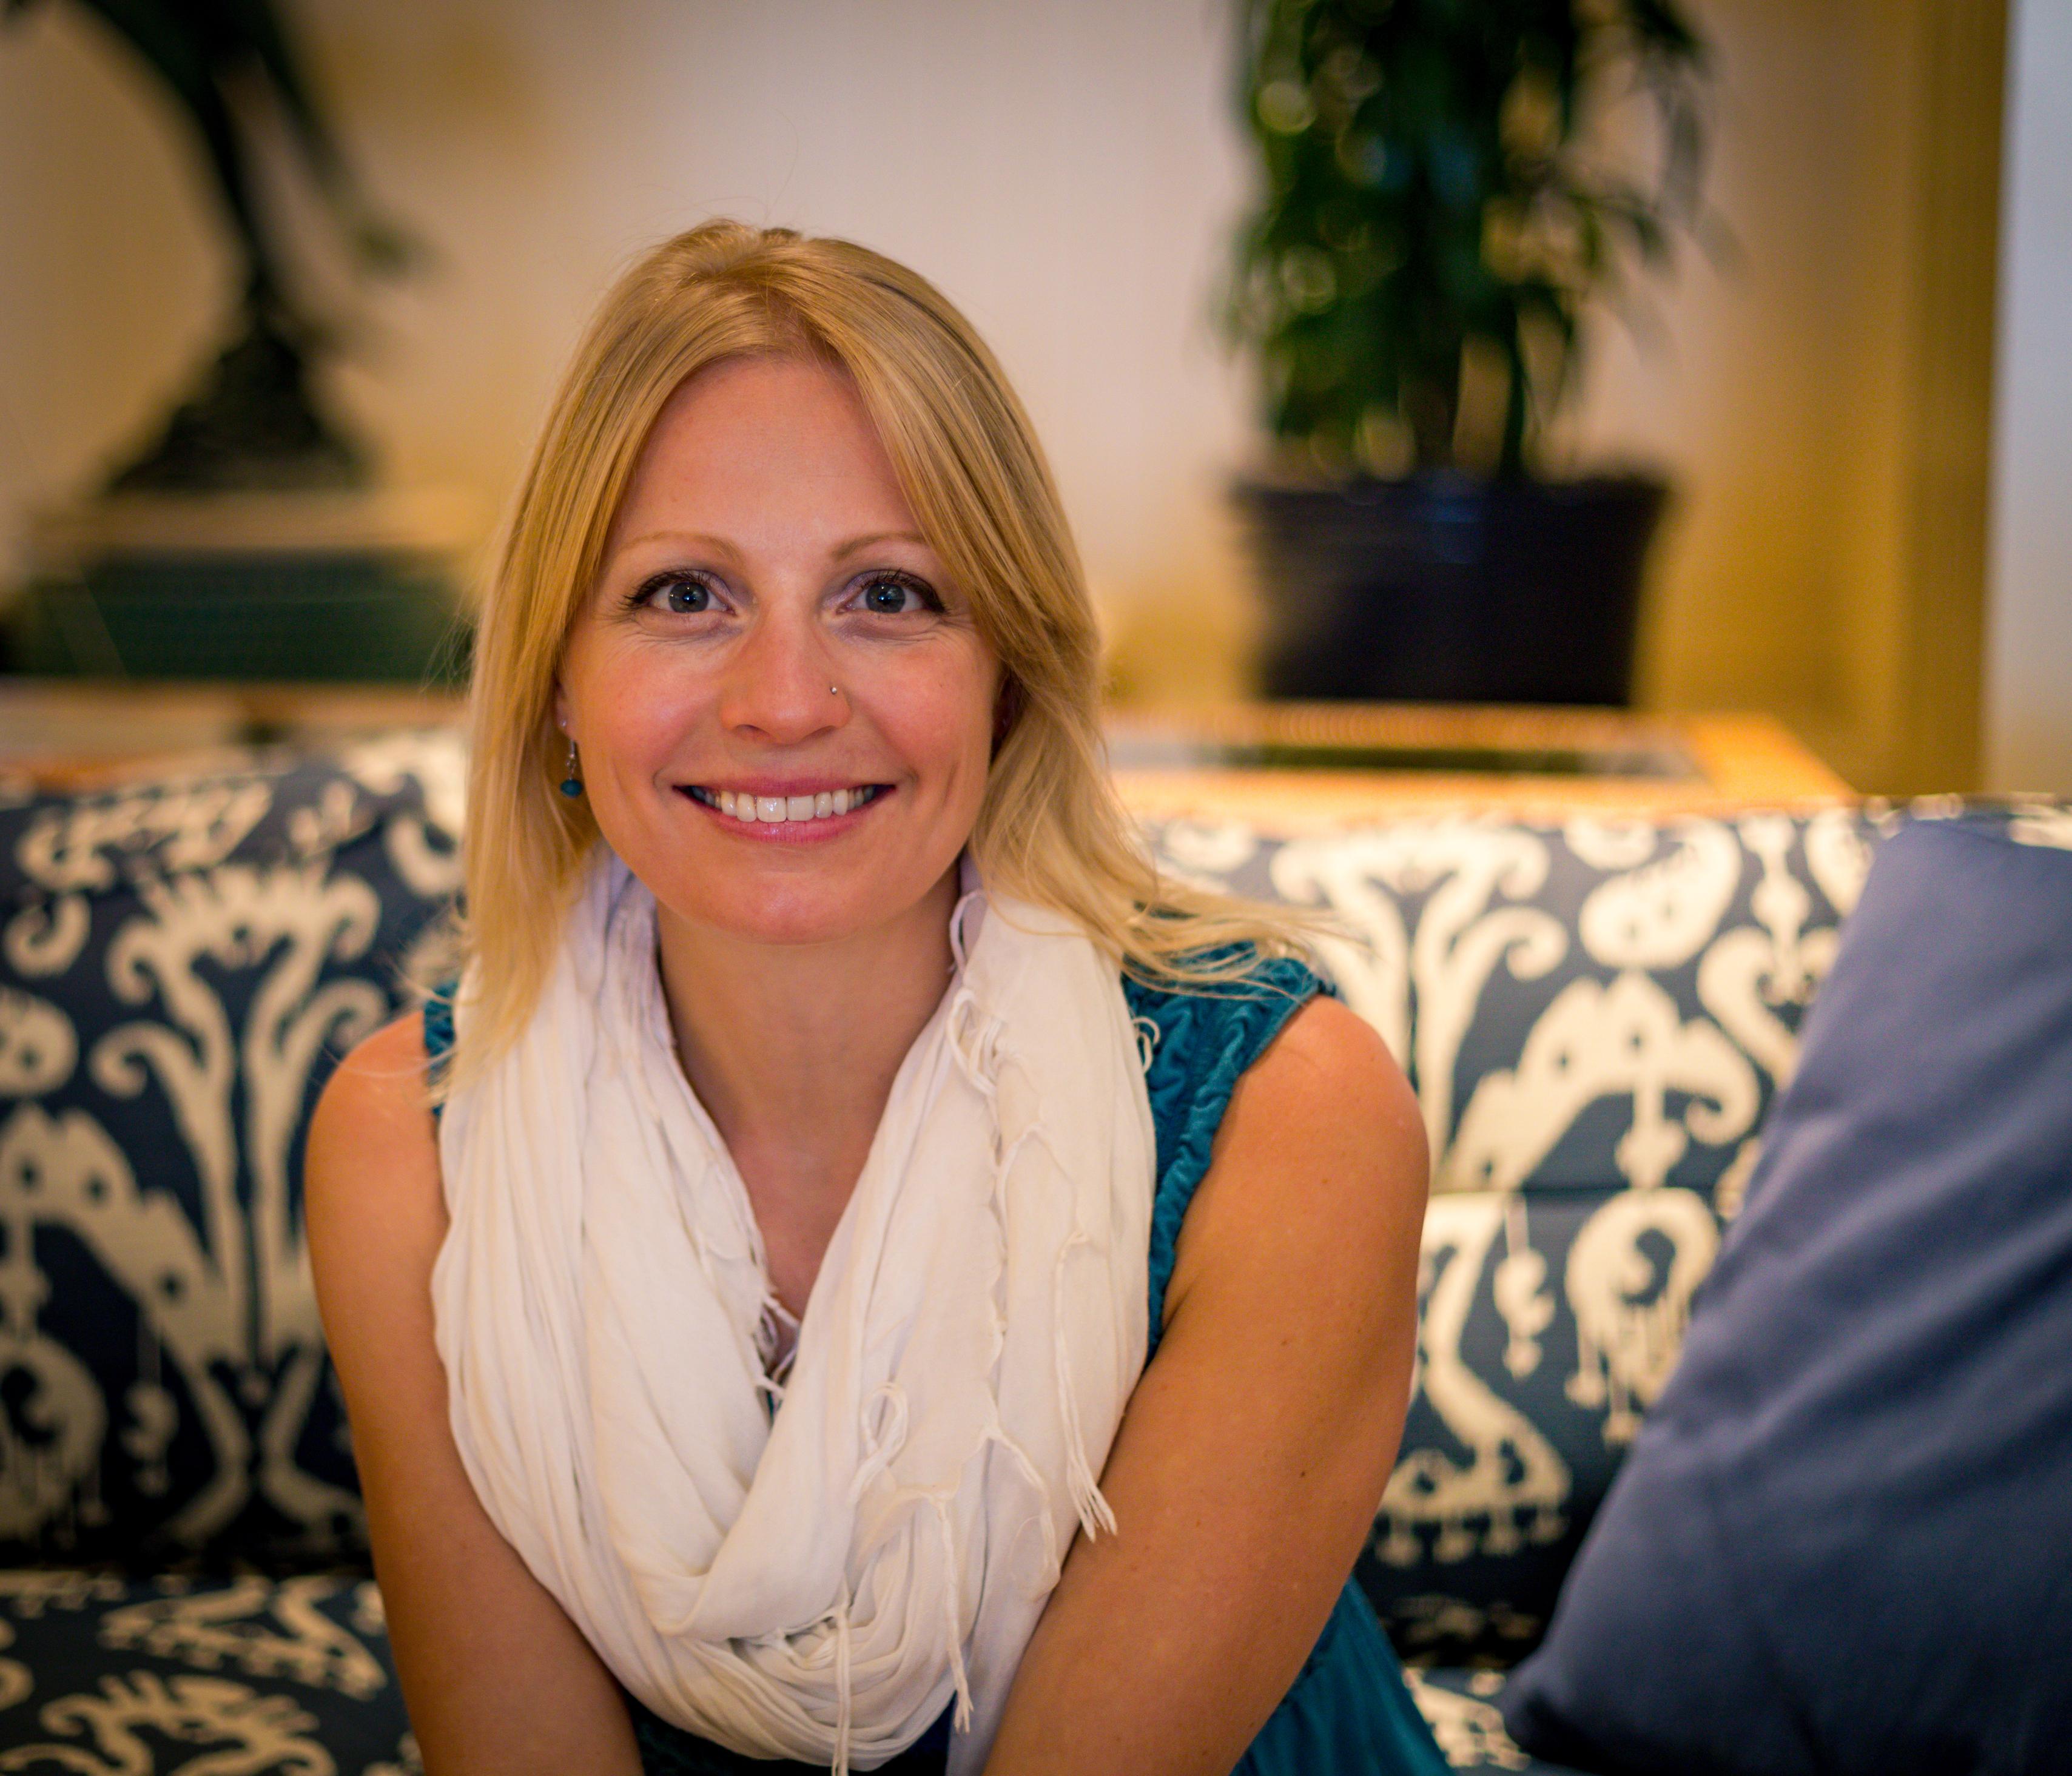 Dr. Elizabeth Cherevaty, Women's Health, Fertility & Children's Health Naturopath Guelph